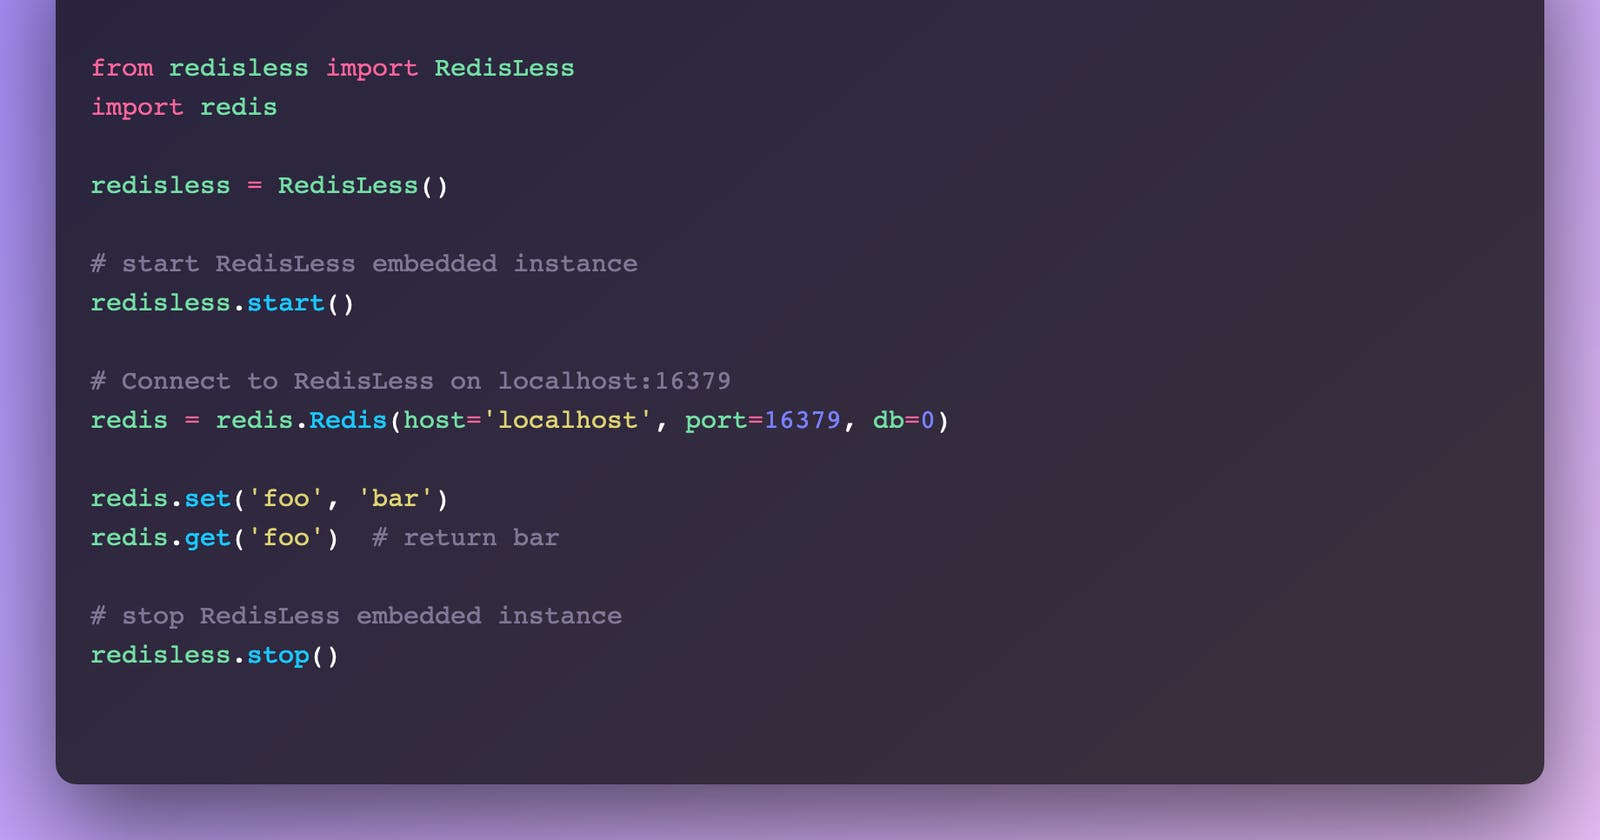 RedisLess - Blazingly fast Serverless Redis